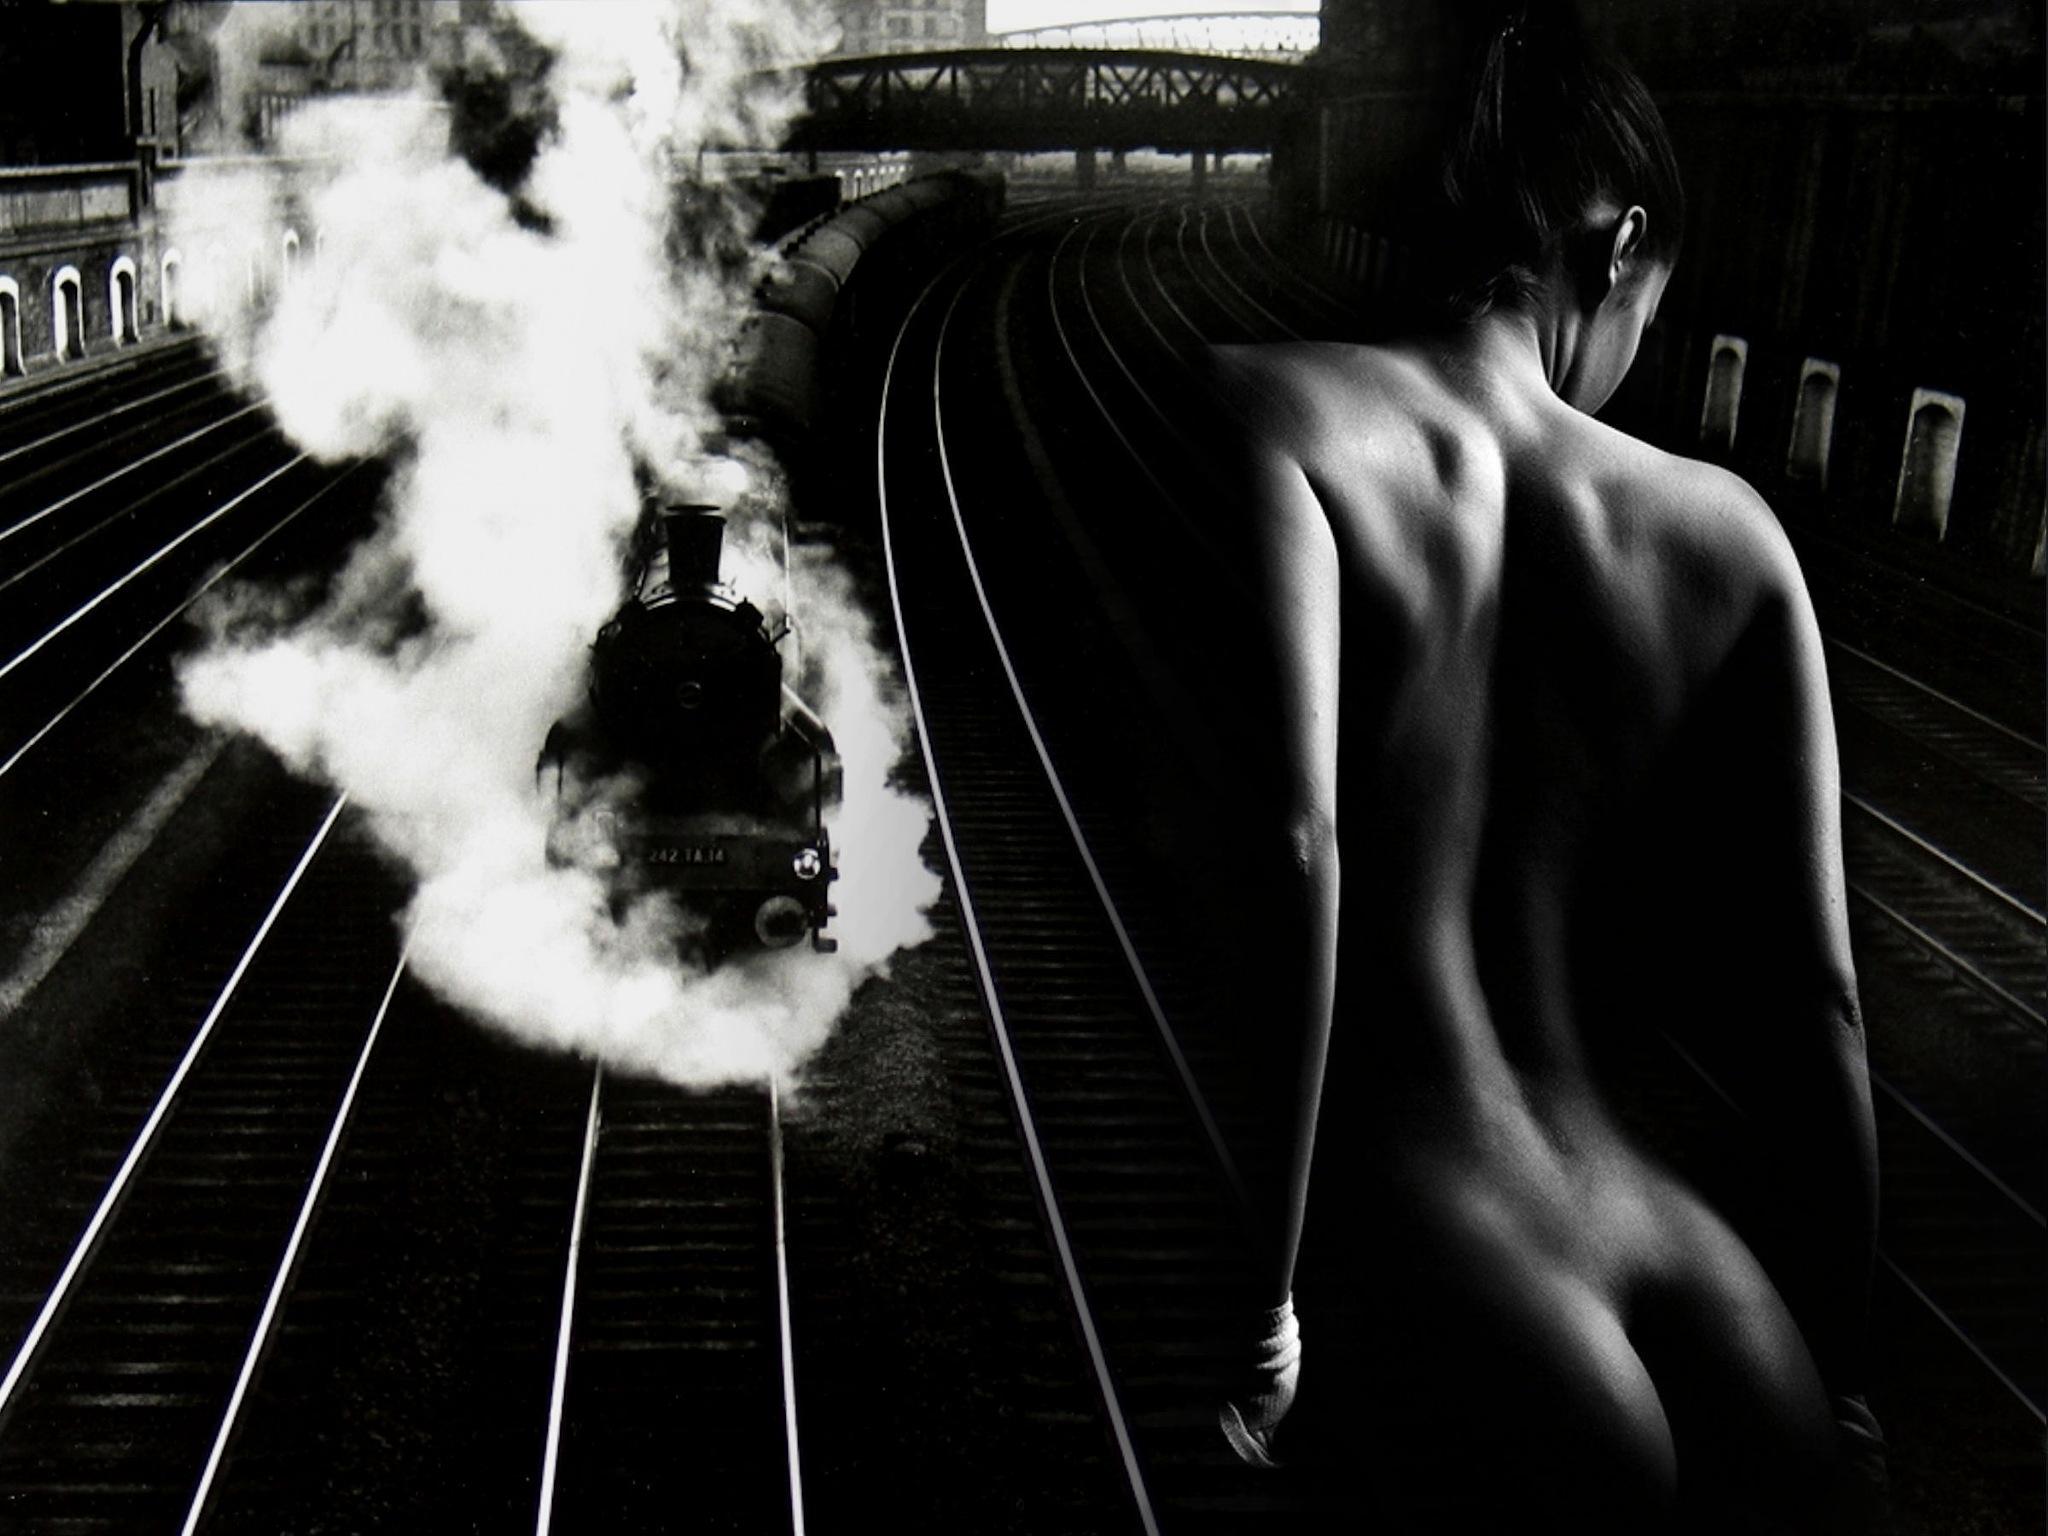 The Last Train by Alexandros Raskolnick